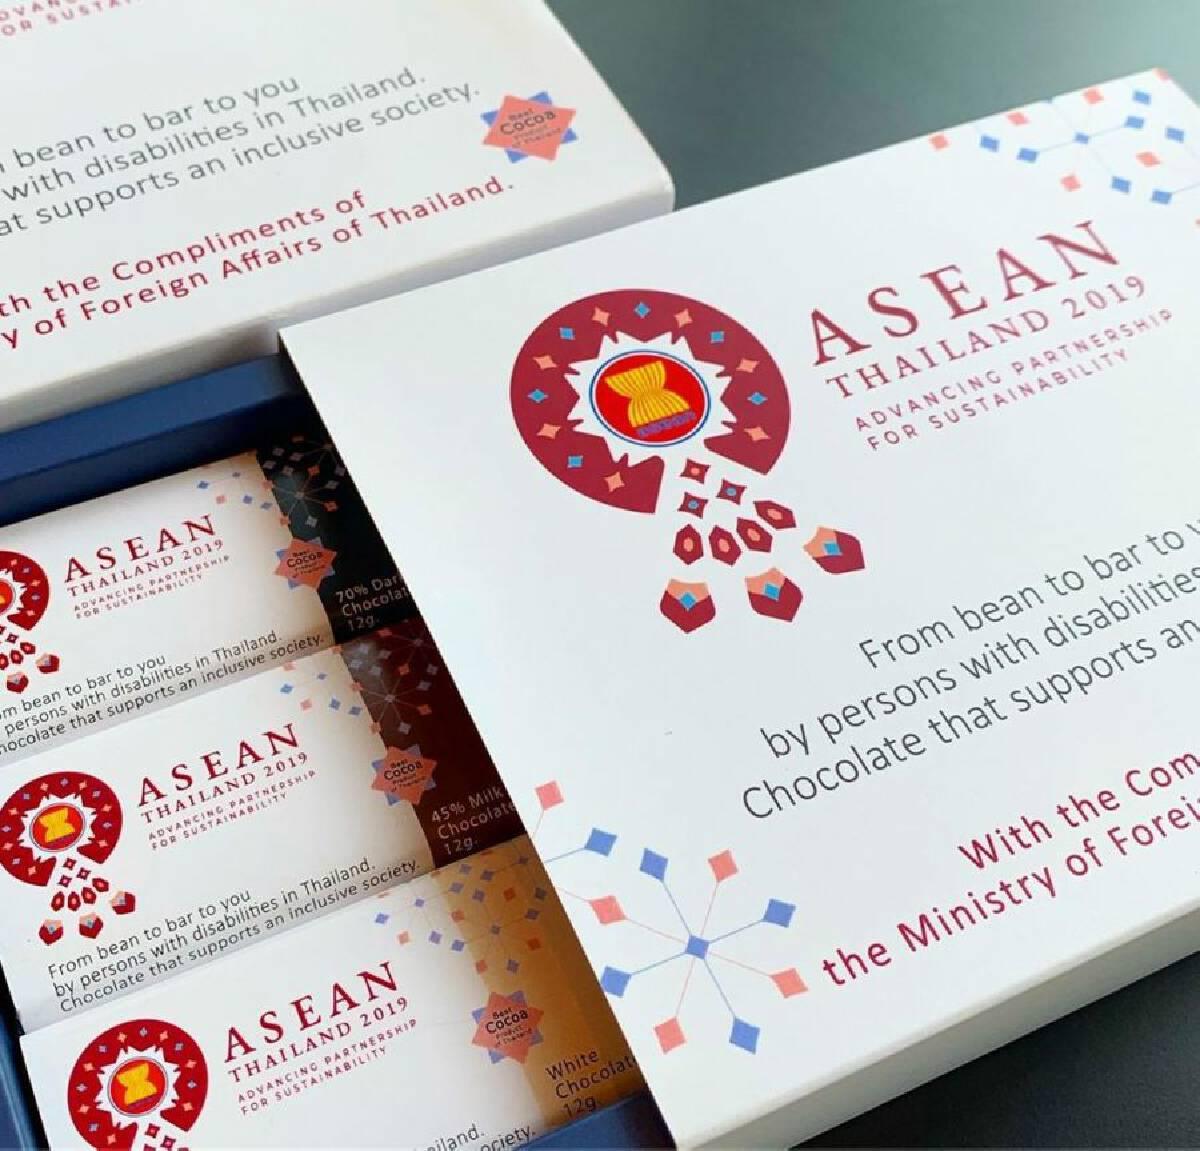 Mark Rin Chocolate: Good mood enhancer for Asean leaders during summit